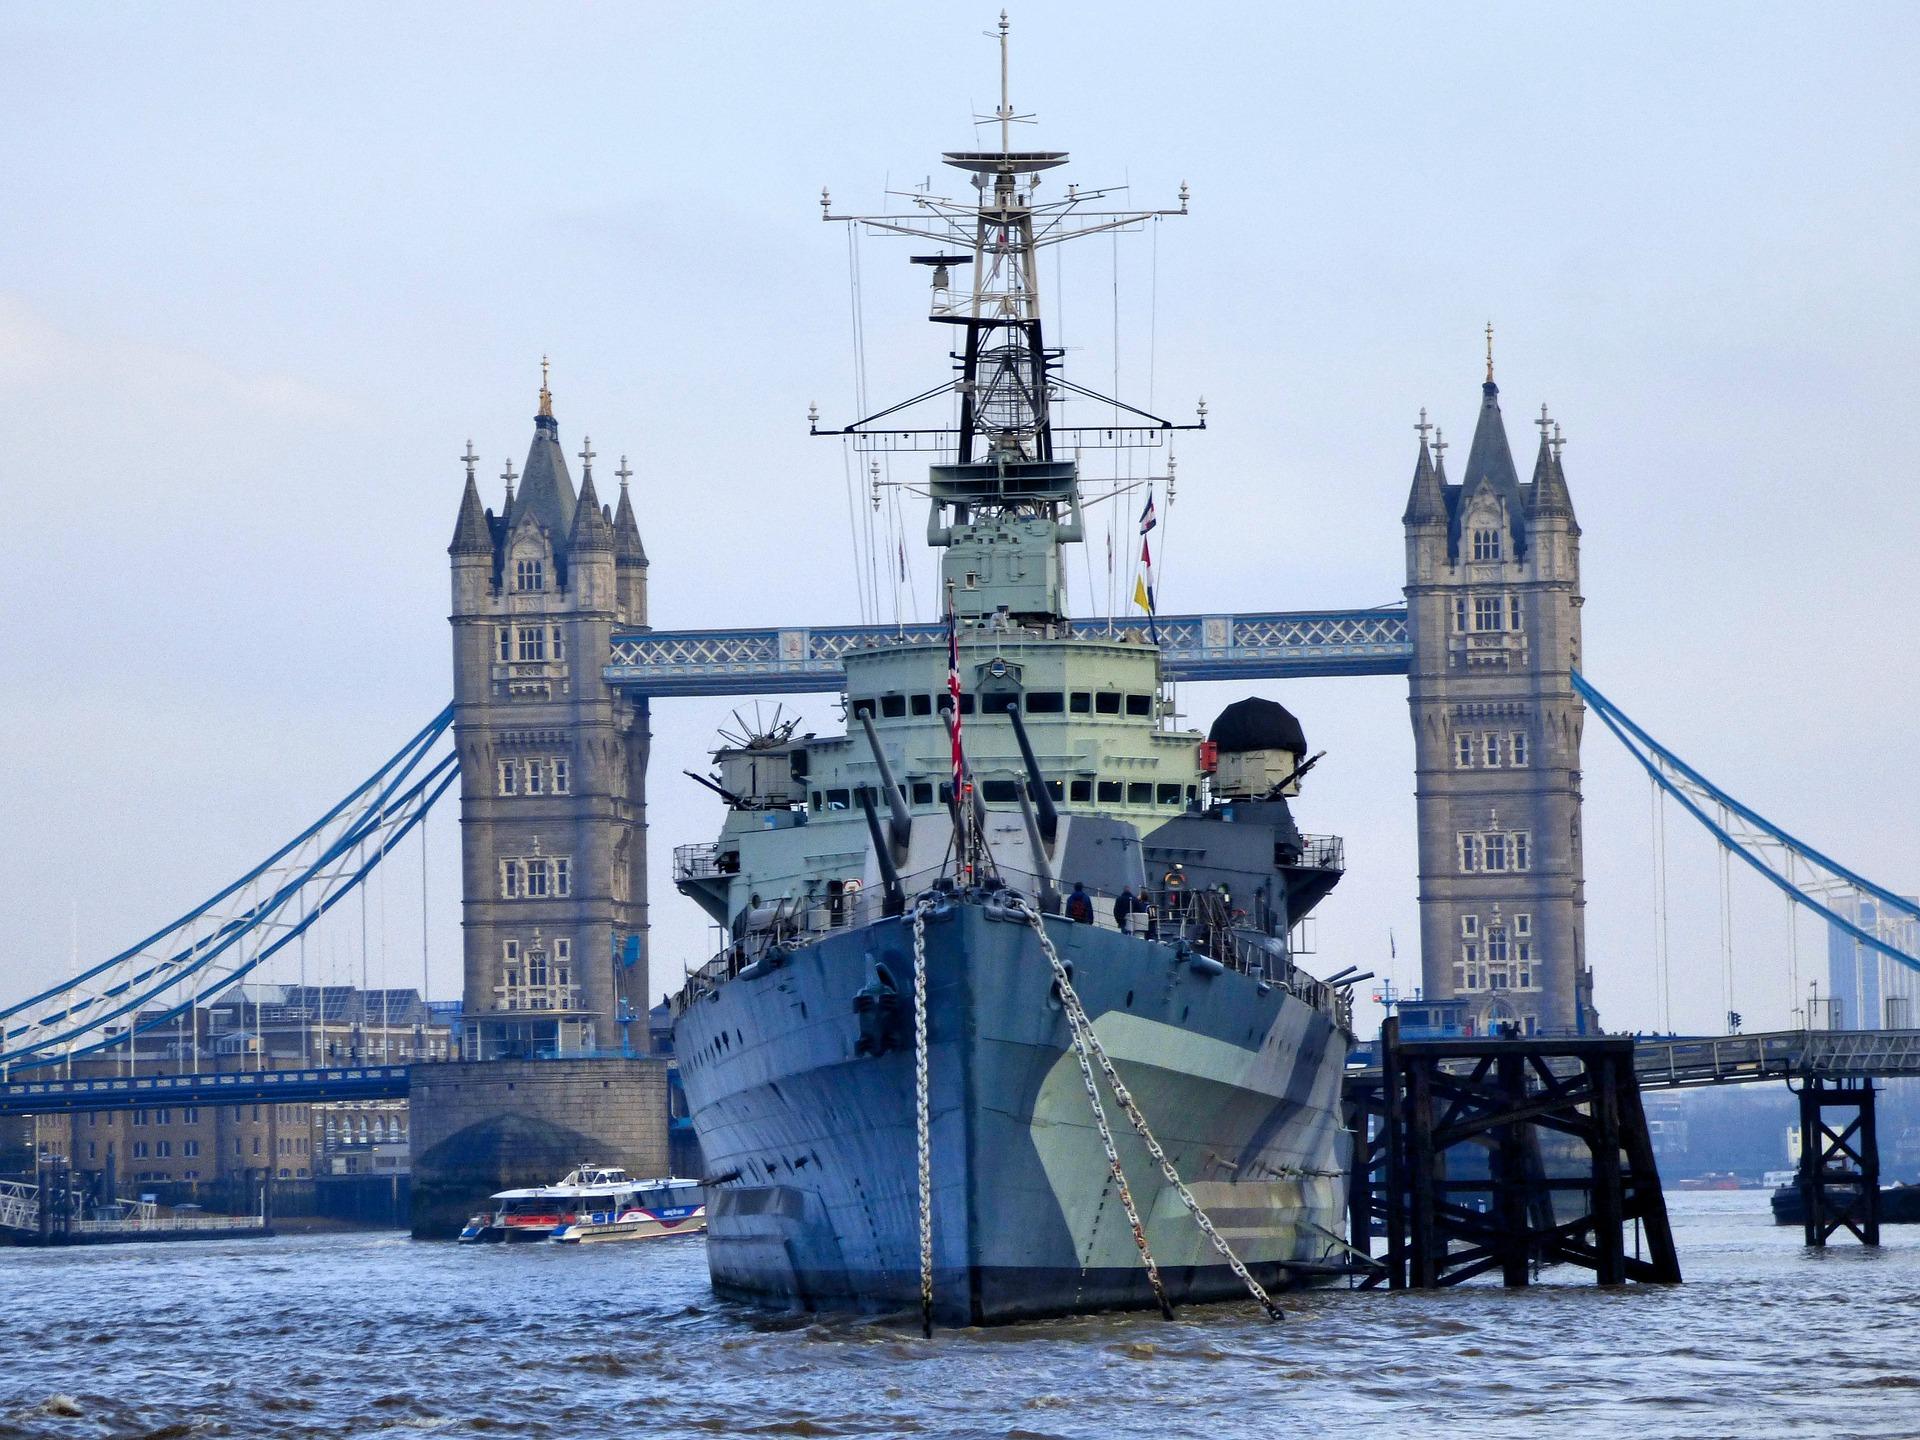 HMS Belfast Naval Ship